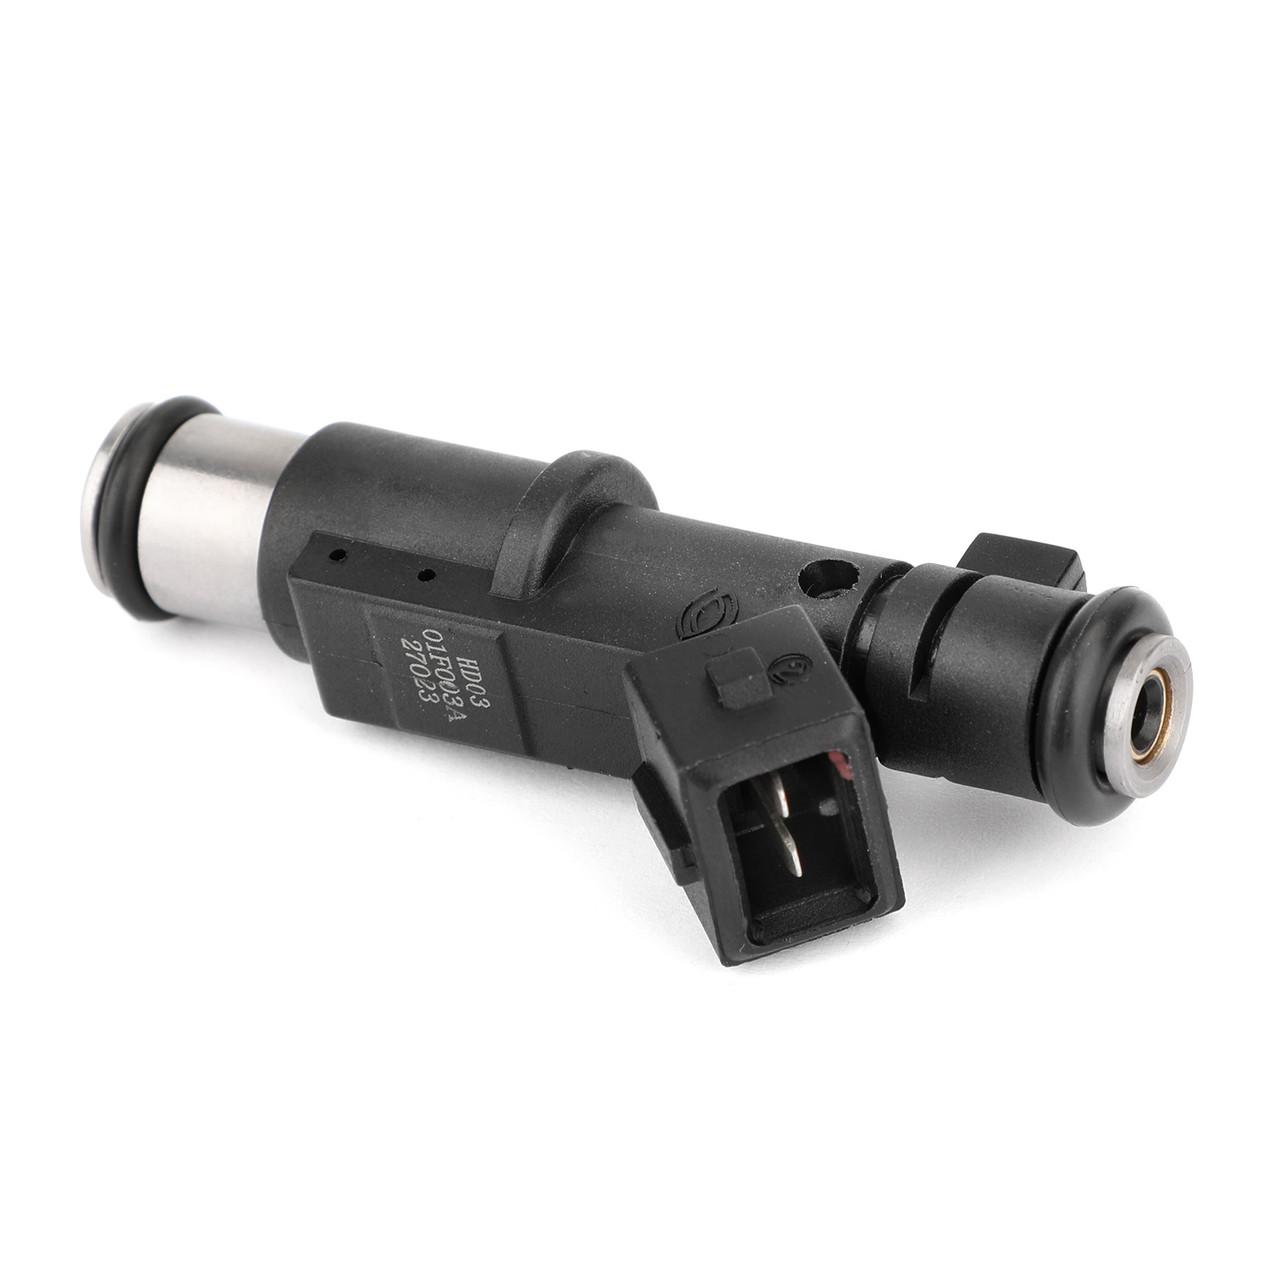 4Pcs Genuine Petrol Fuel Injector For Citroen C5 C4 C8 DISPATCH JUMPY SYNERGIE XSARA Black